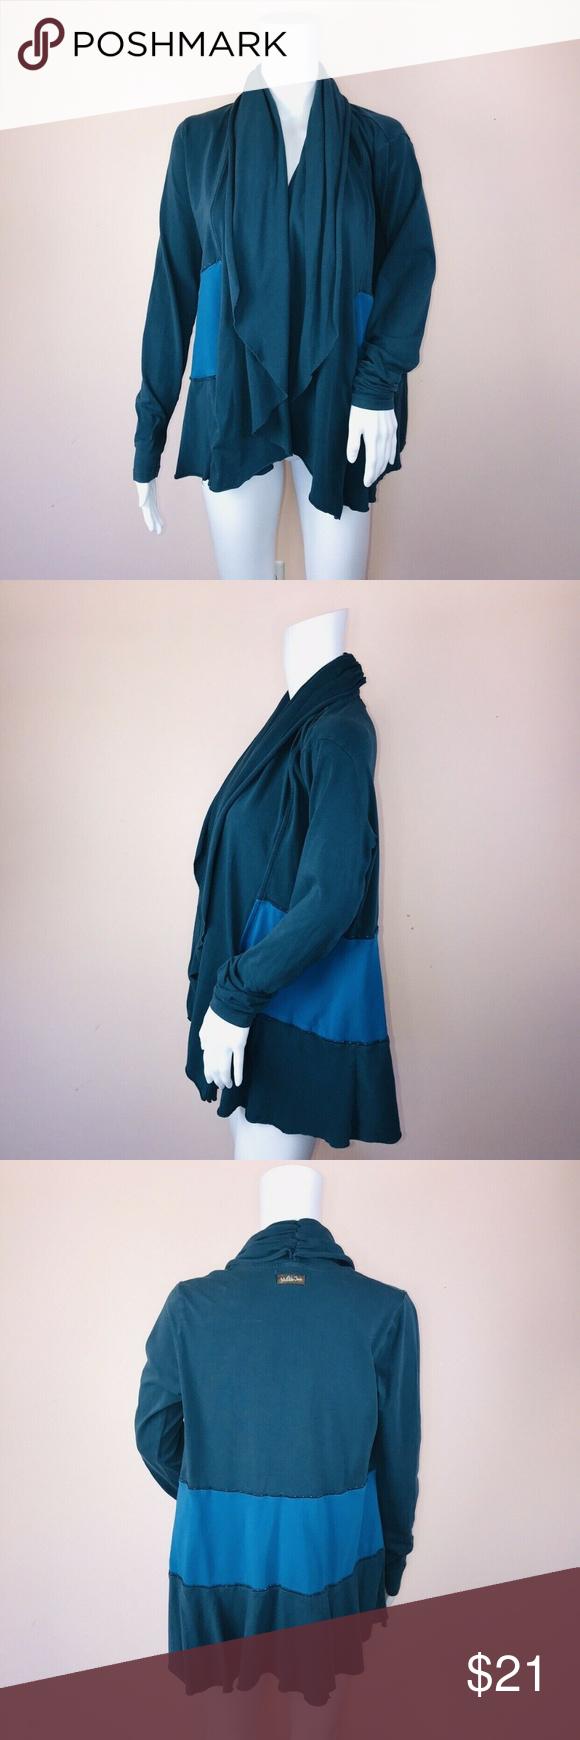 Matilda Jane Moody Jersey Knit Cardigan Blue   Jersey knit ...